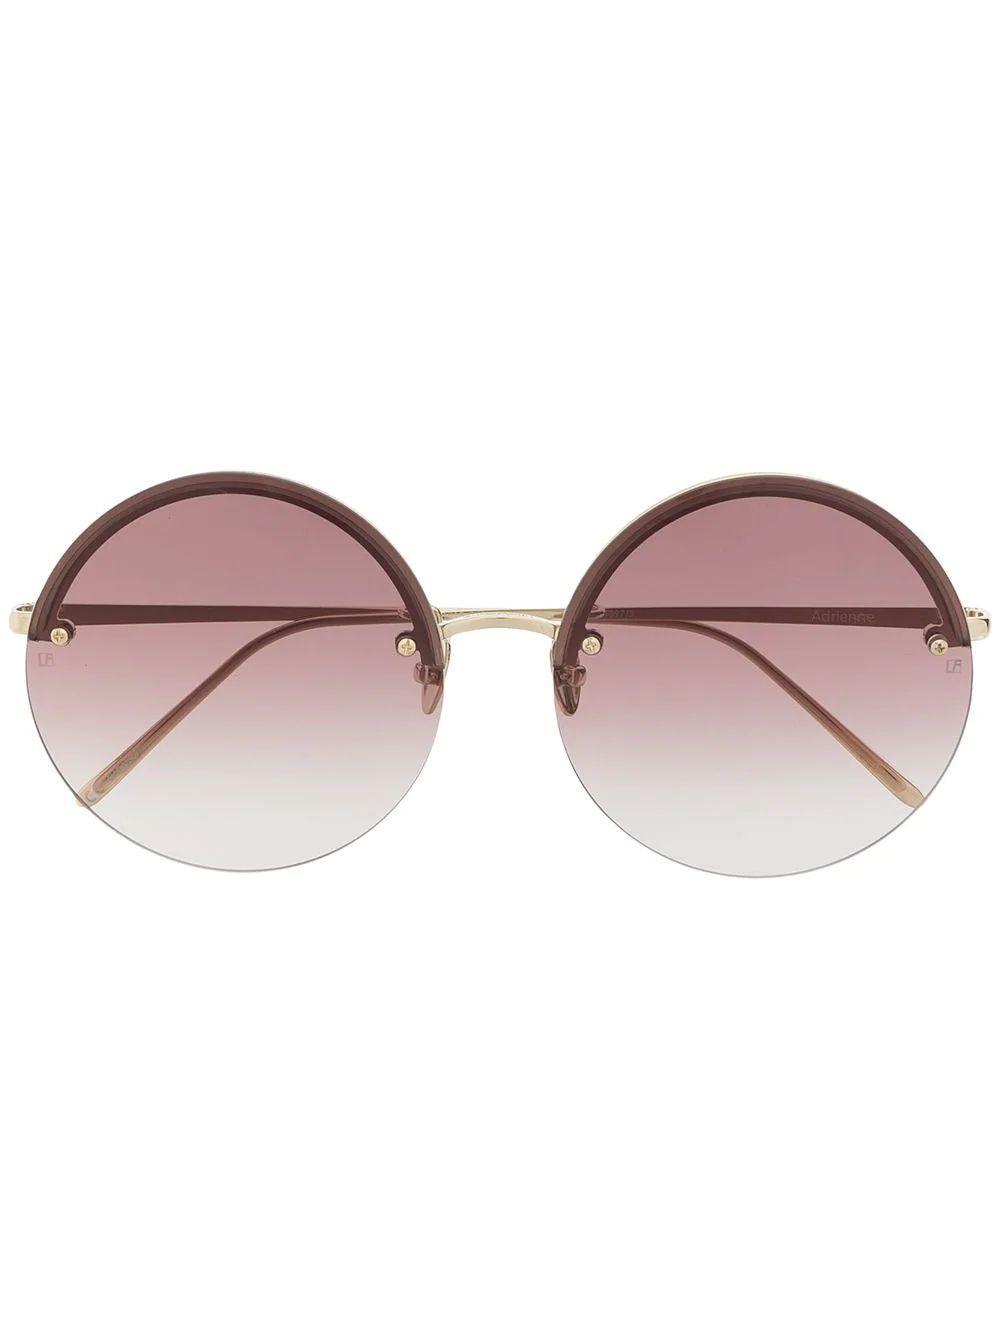 Adrienne Round Sunglasses Item # LFL1097C5SUN-C